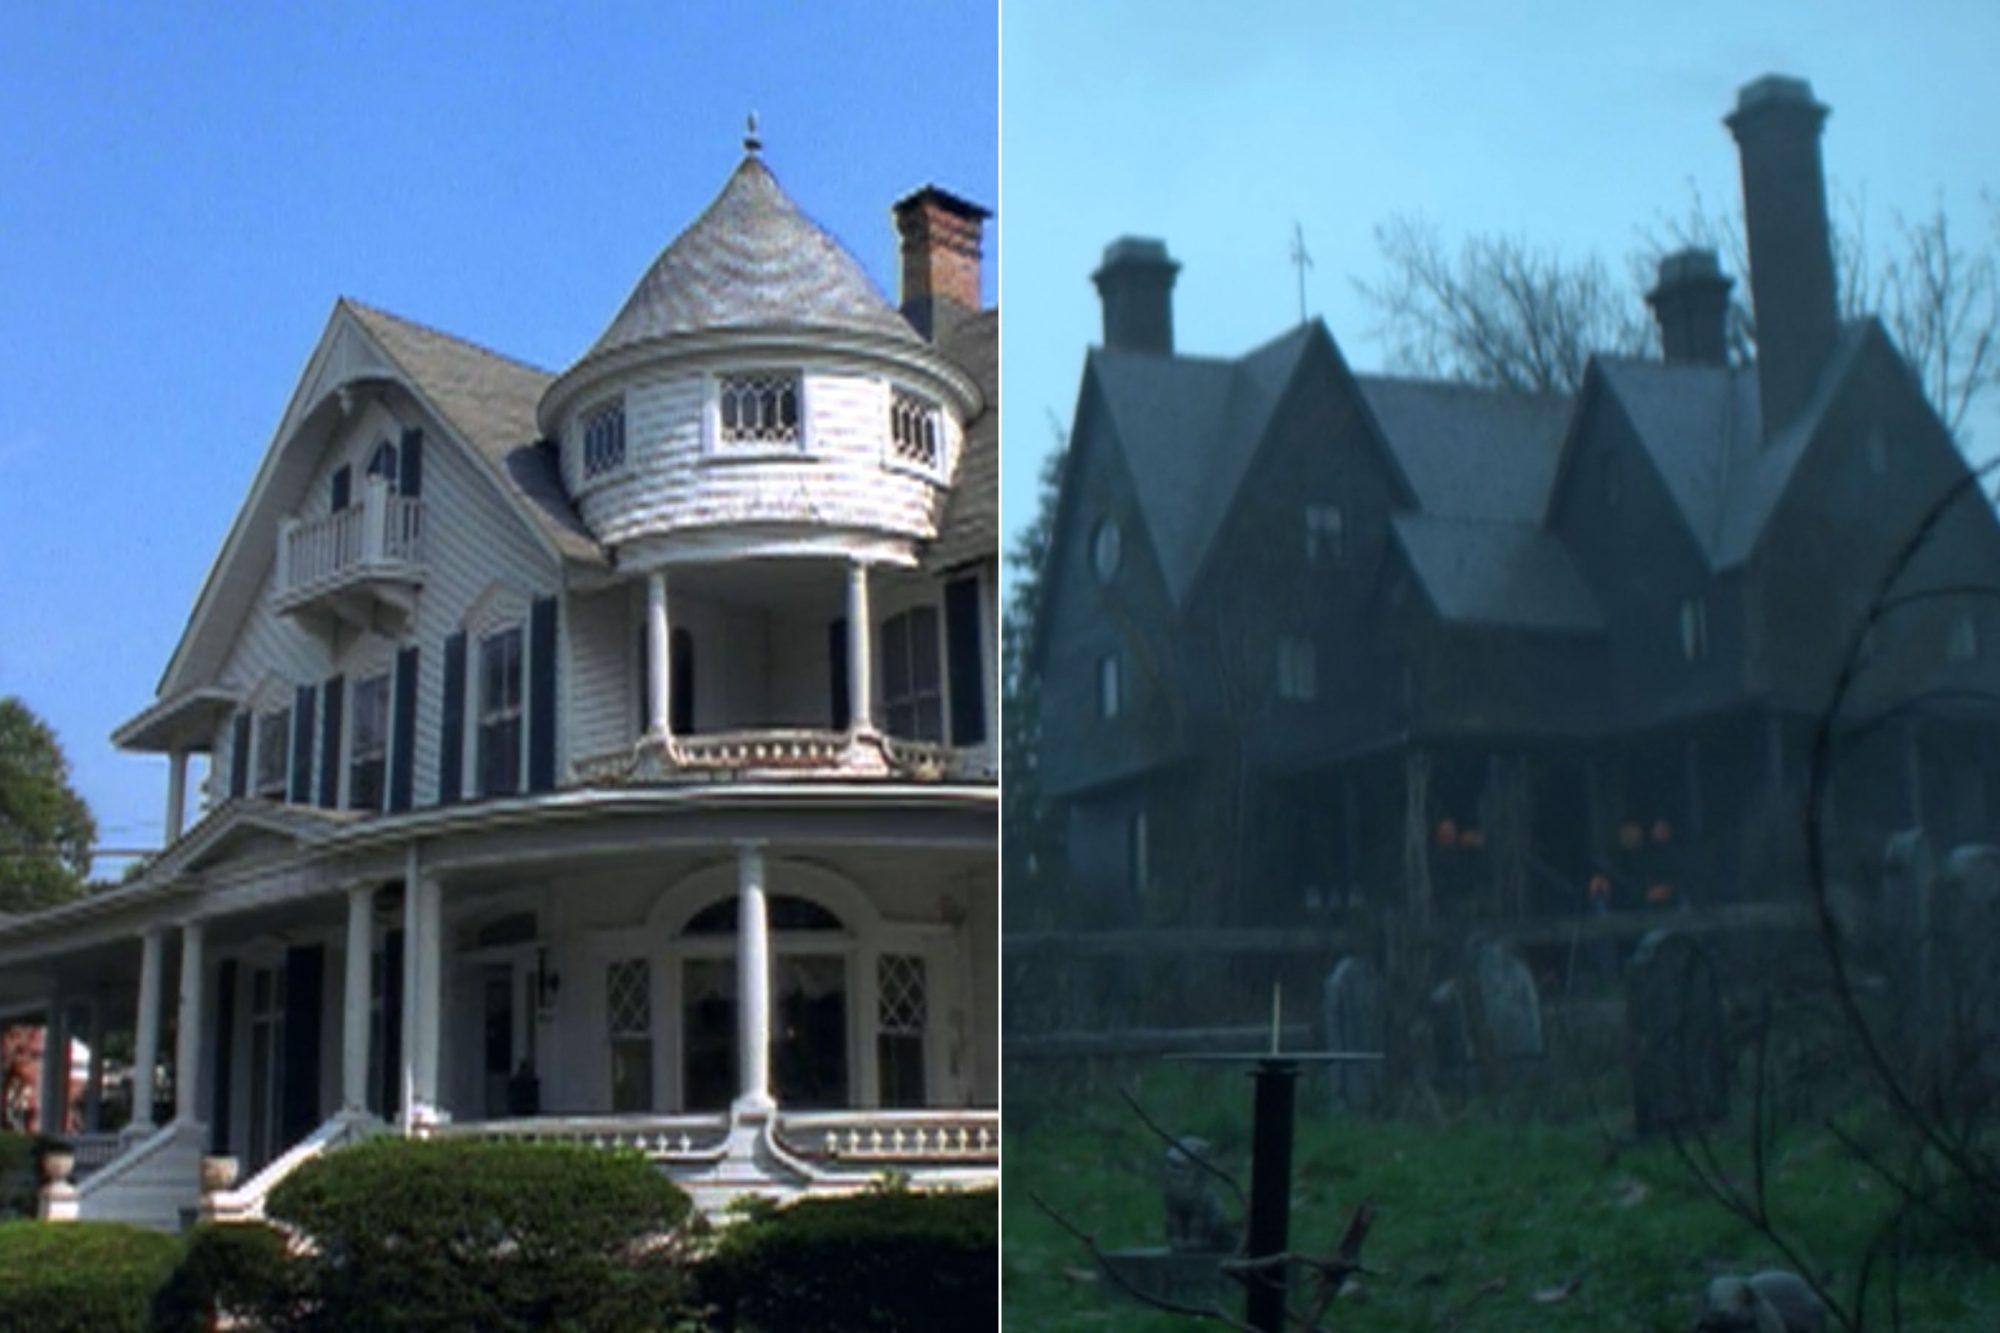 The Spellman House